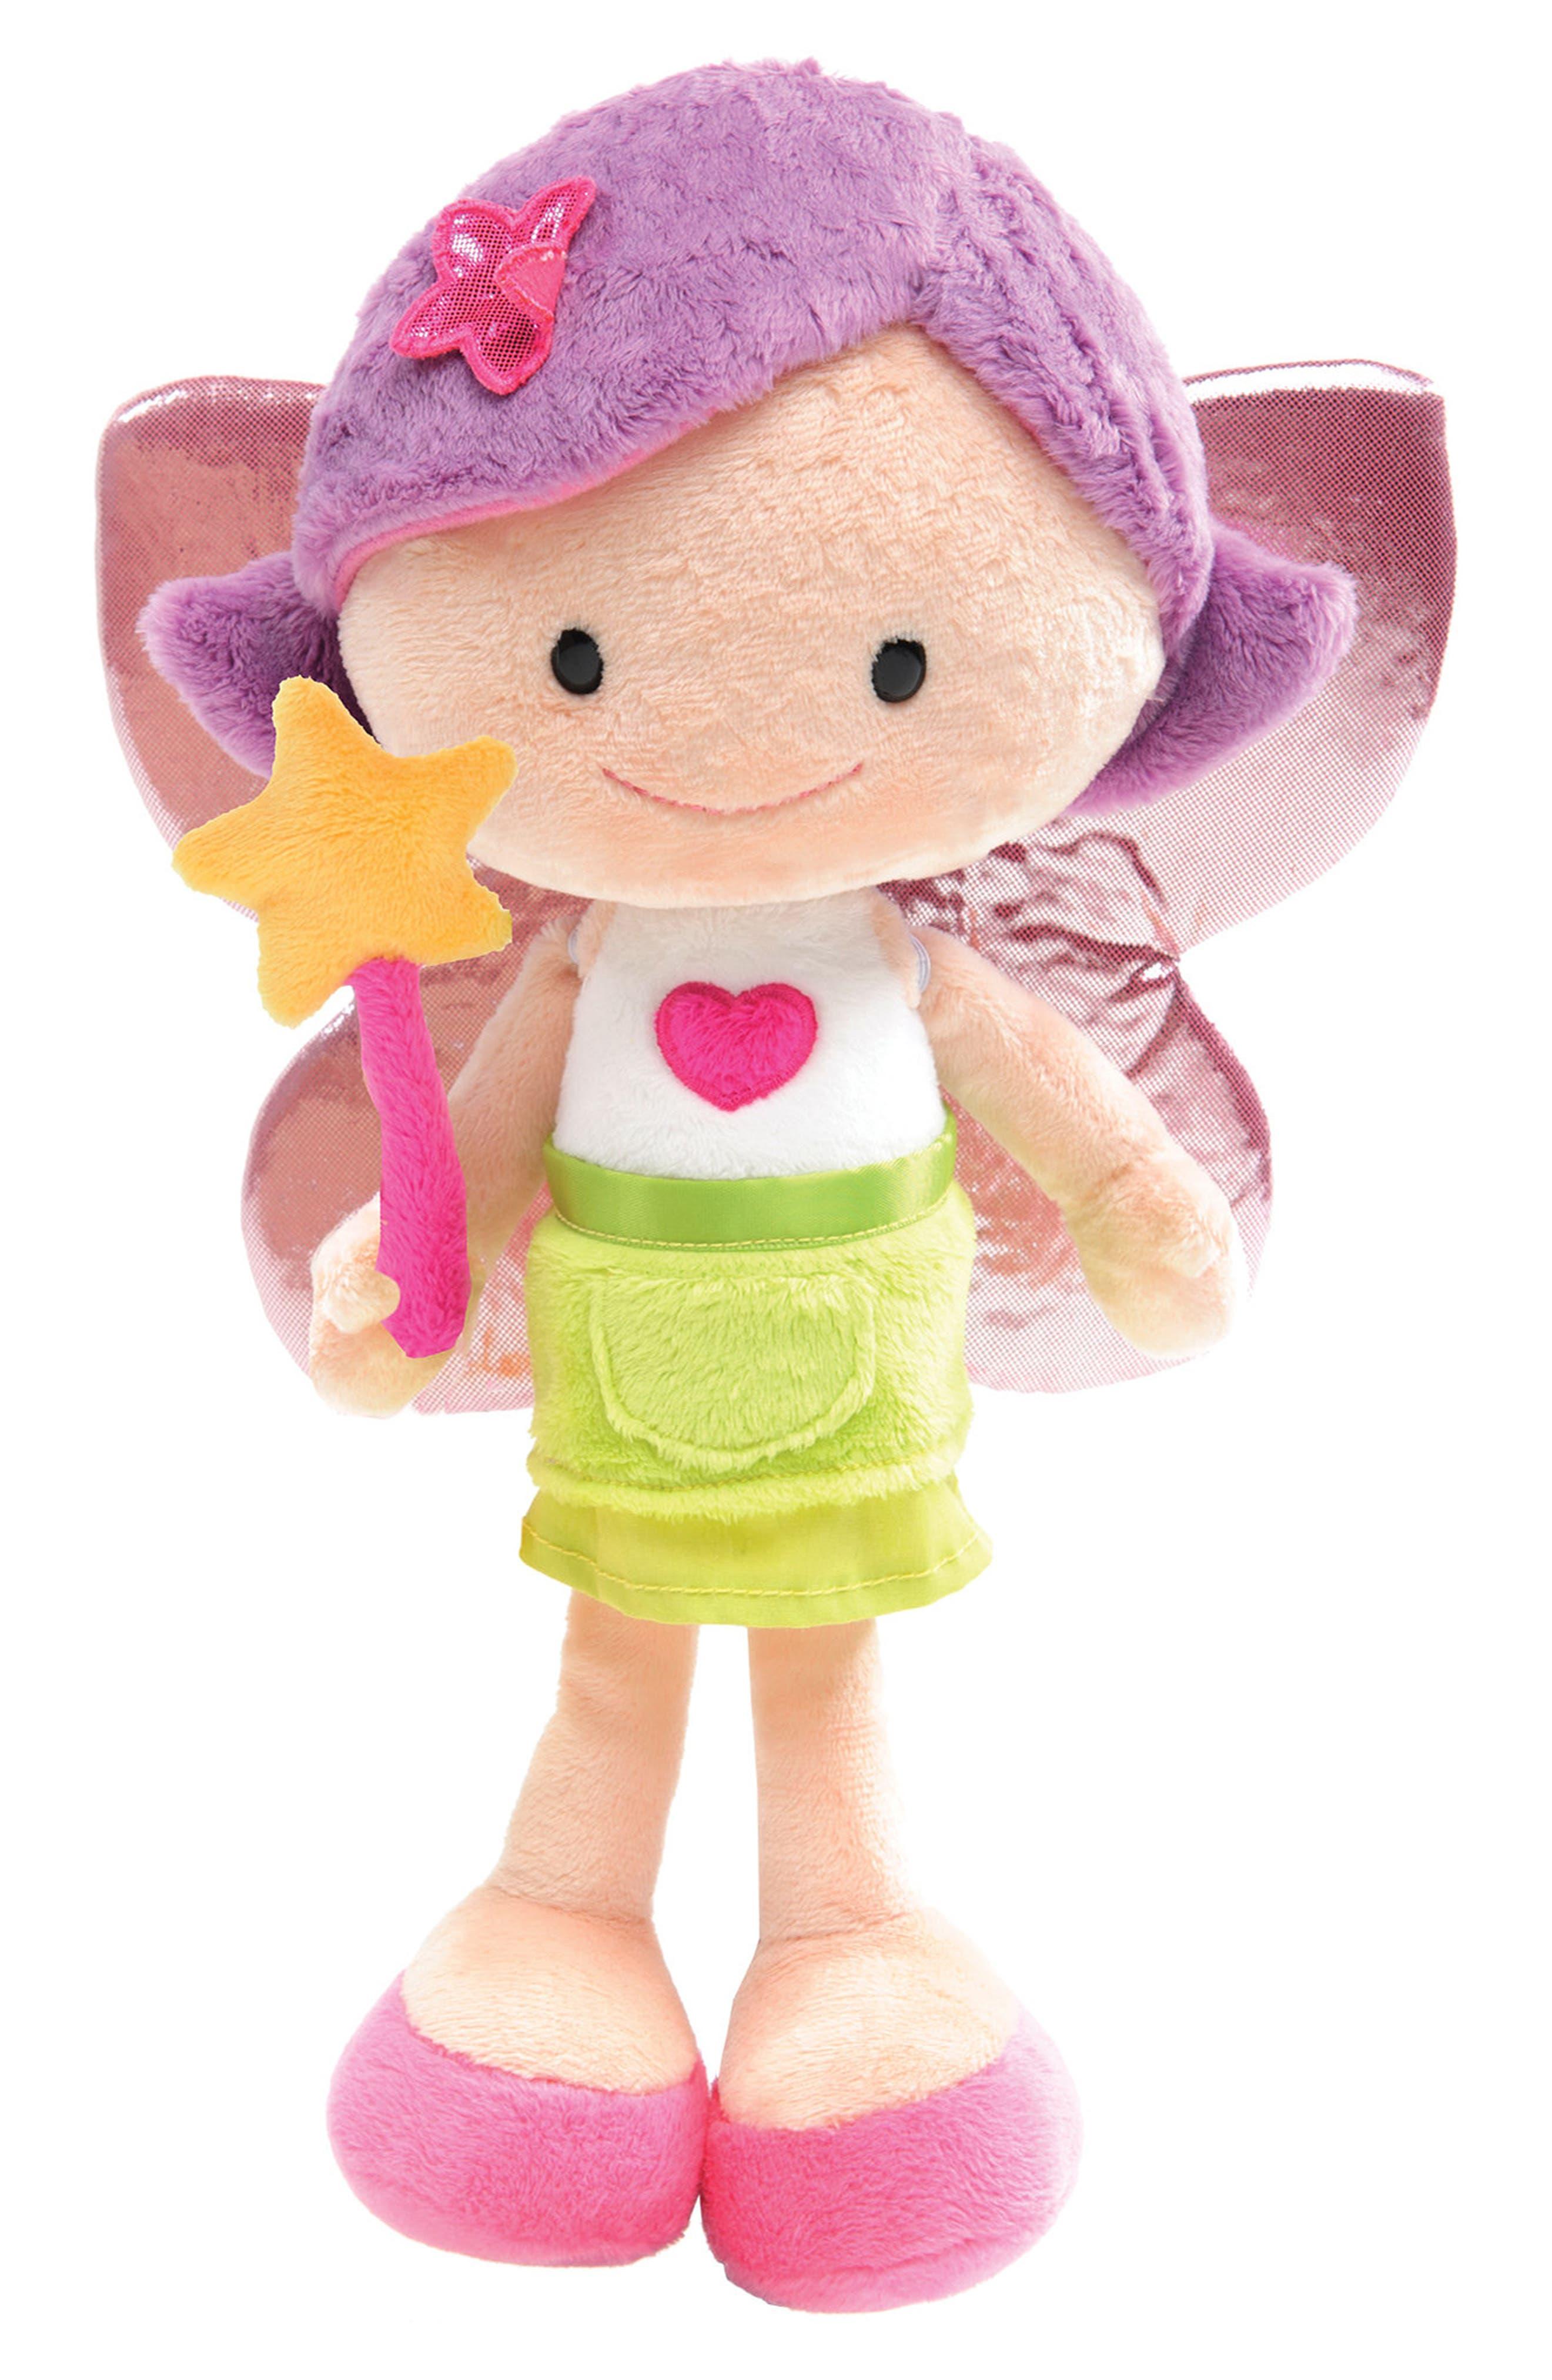 Main Image - Neat Oh! Nici® Wonderland Minimorgan the Fairy Plush Doll